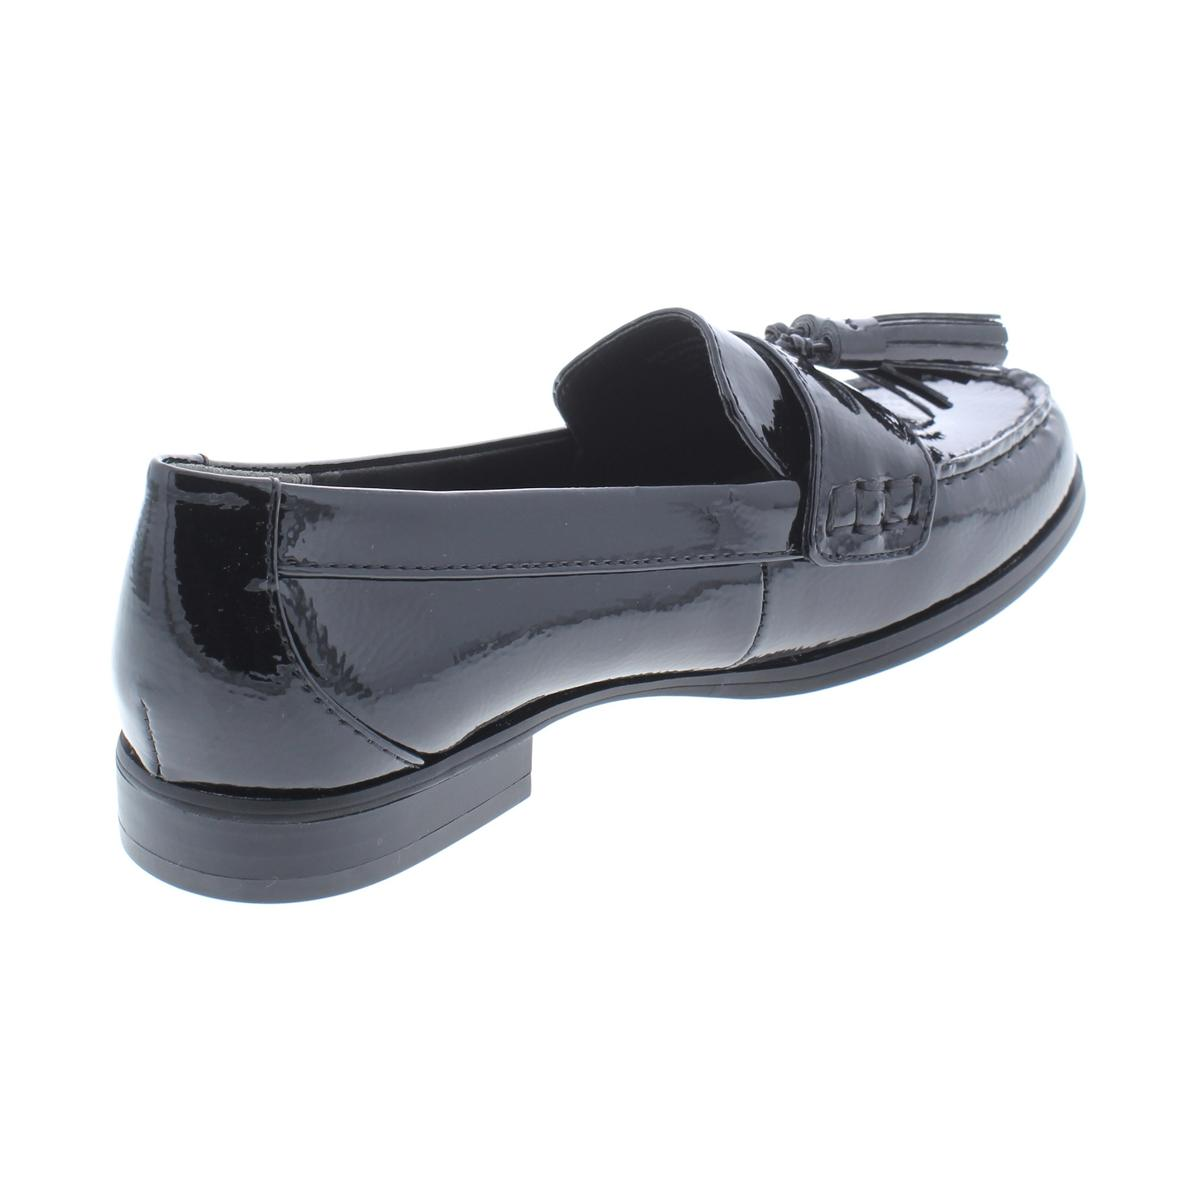 Giani-Bernini-Womens-Mauwe-Tassel-Padded-Insole-Dress-Loafers-Shoes-BHFO-5784 thumbnail 4